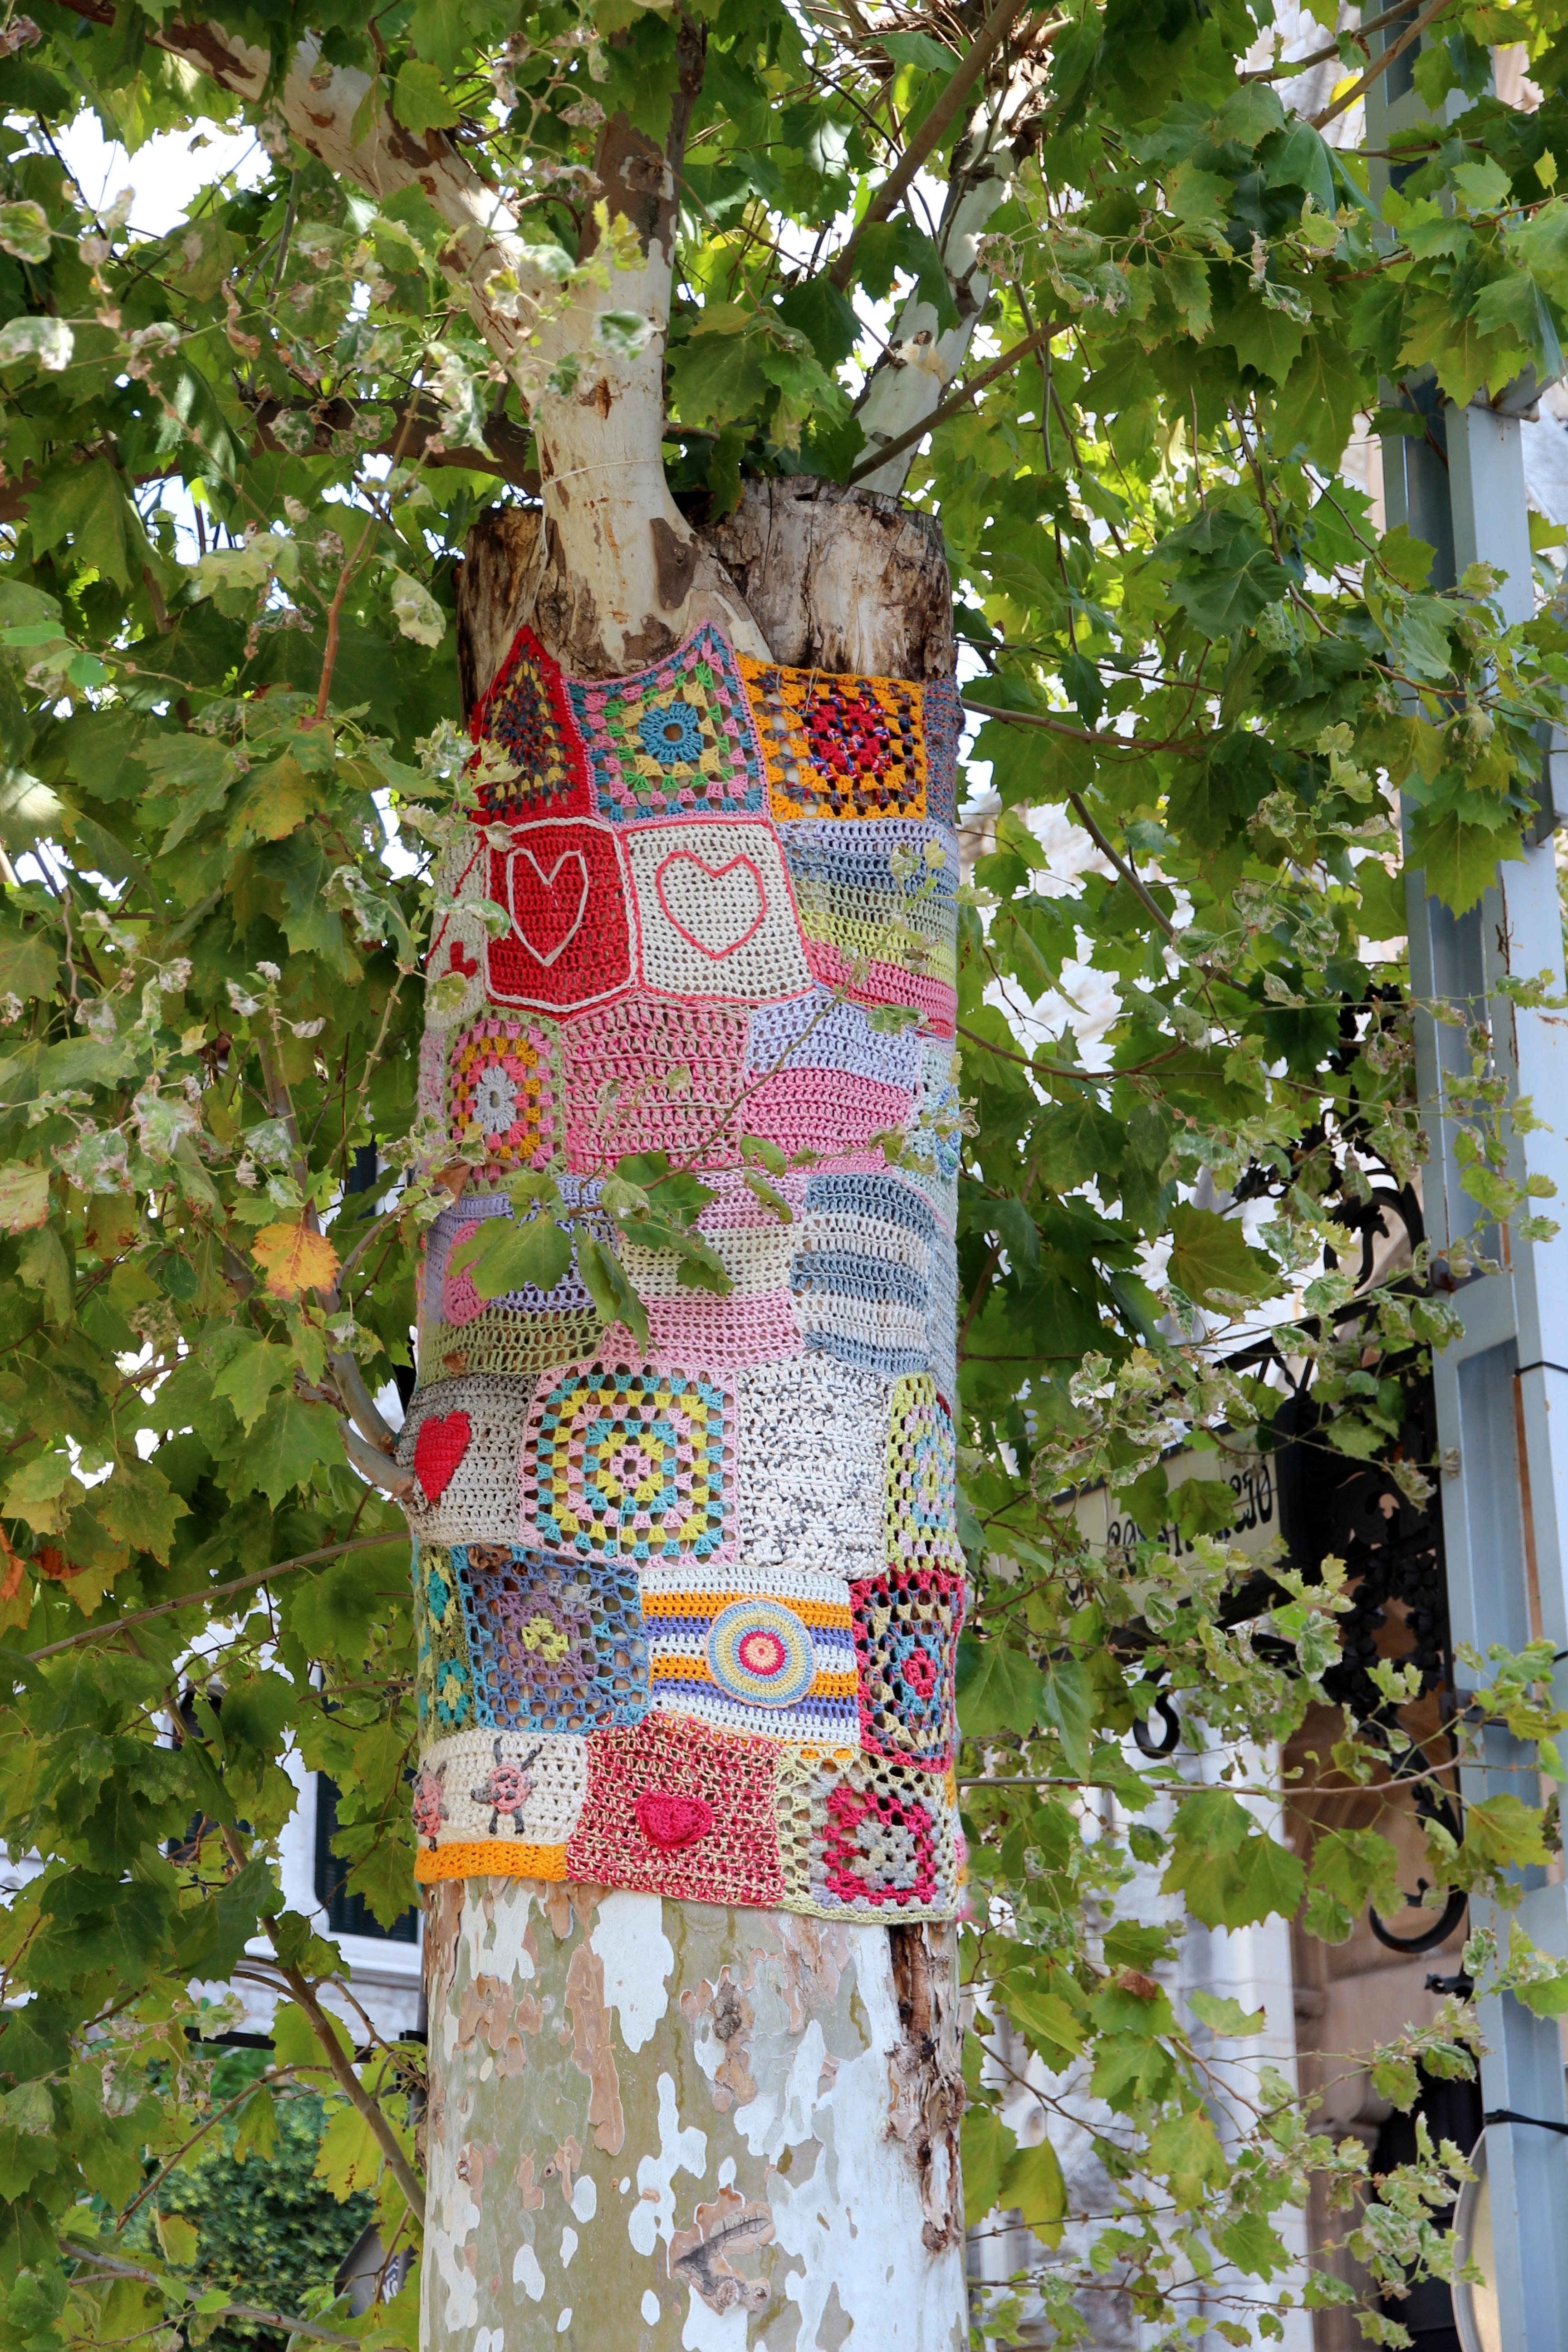 Fotos gratis : árbol, naturaleza, planta, hoja, flor, vistoso, color ...